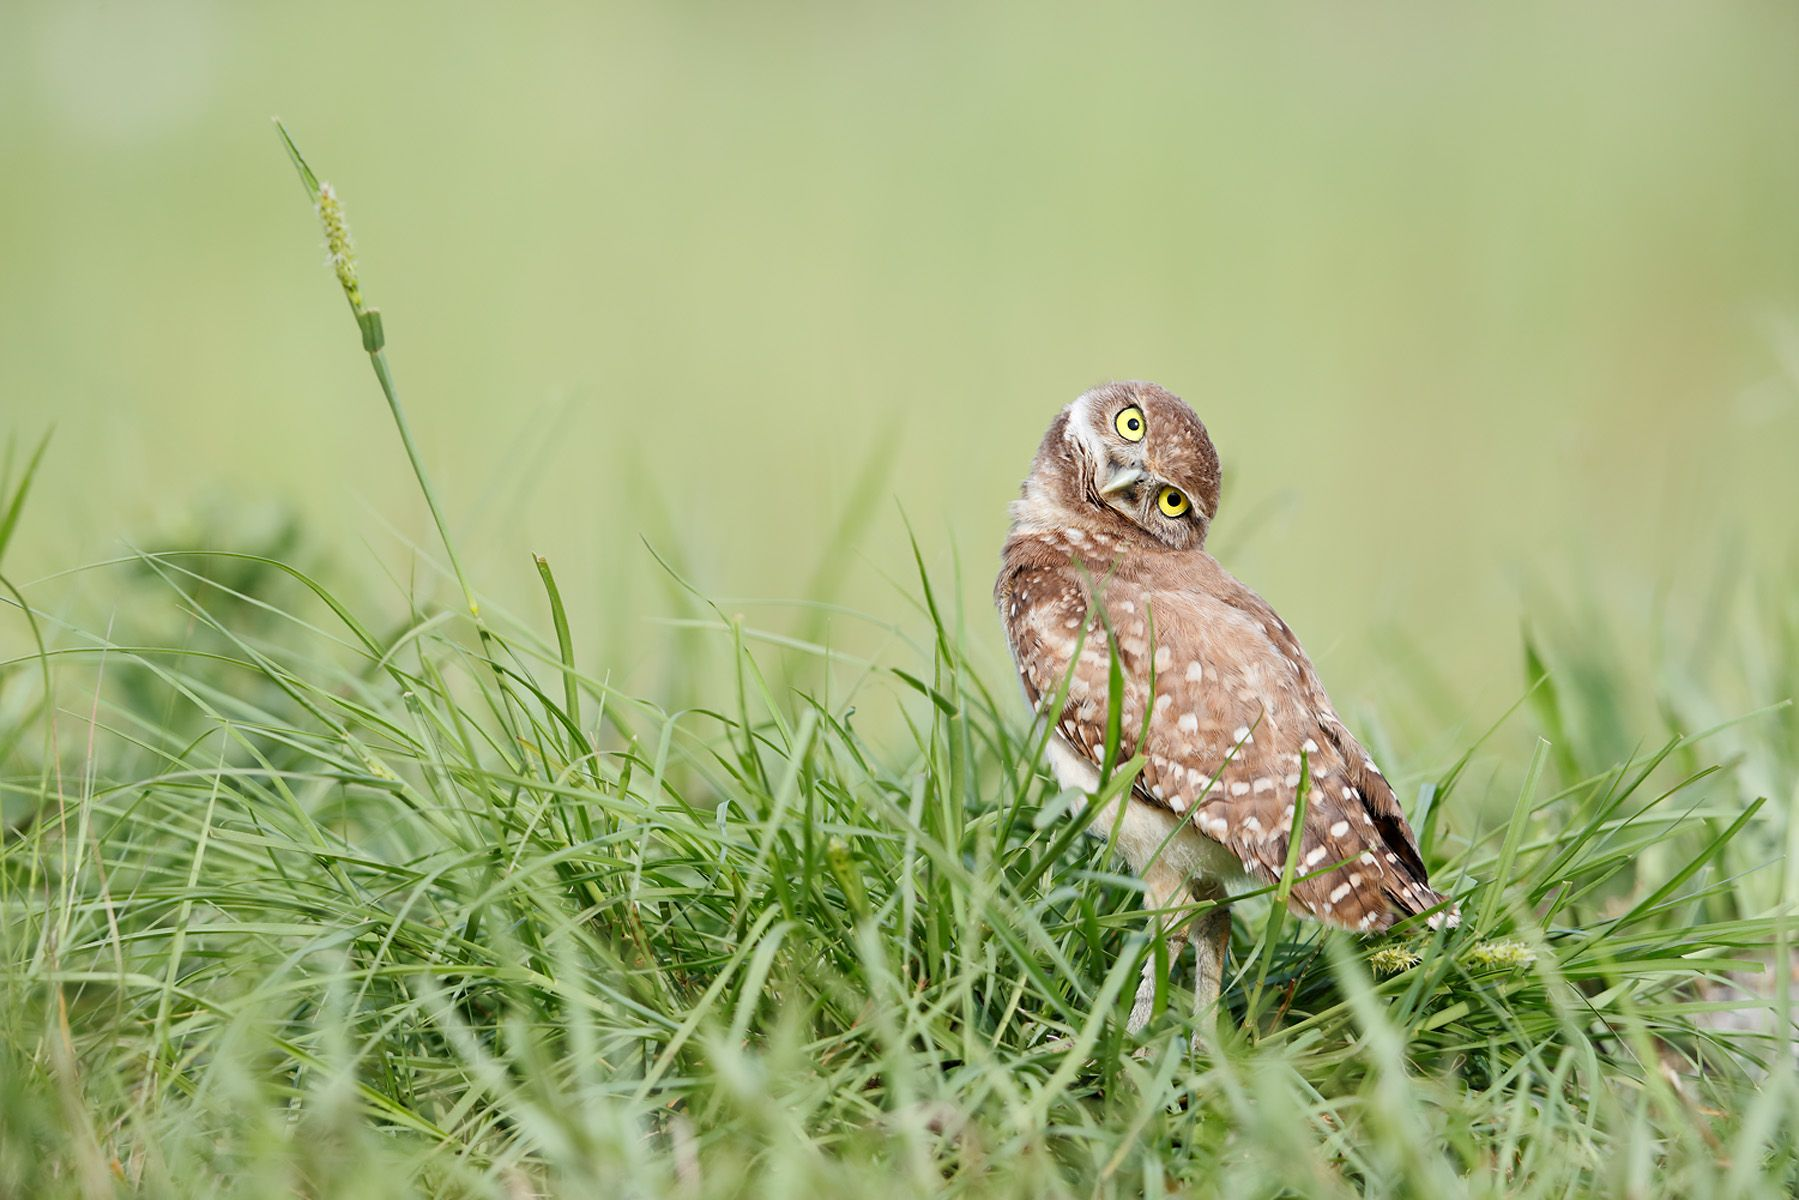 Burrowing owl looking crooked_A3I9632- Boca Raton Airport, FL, USA.jpg